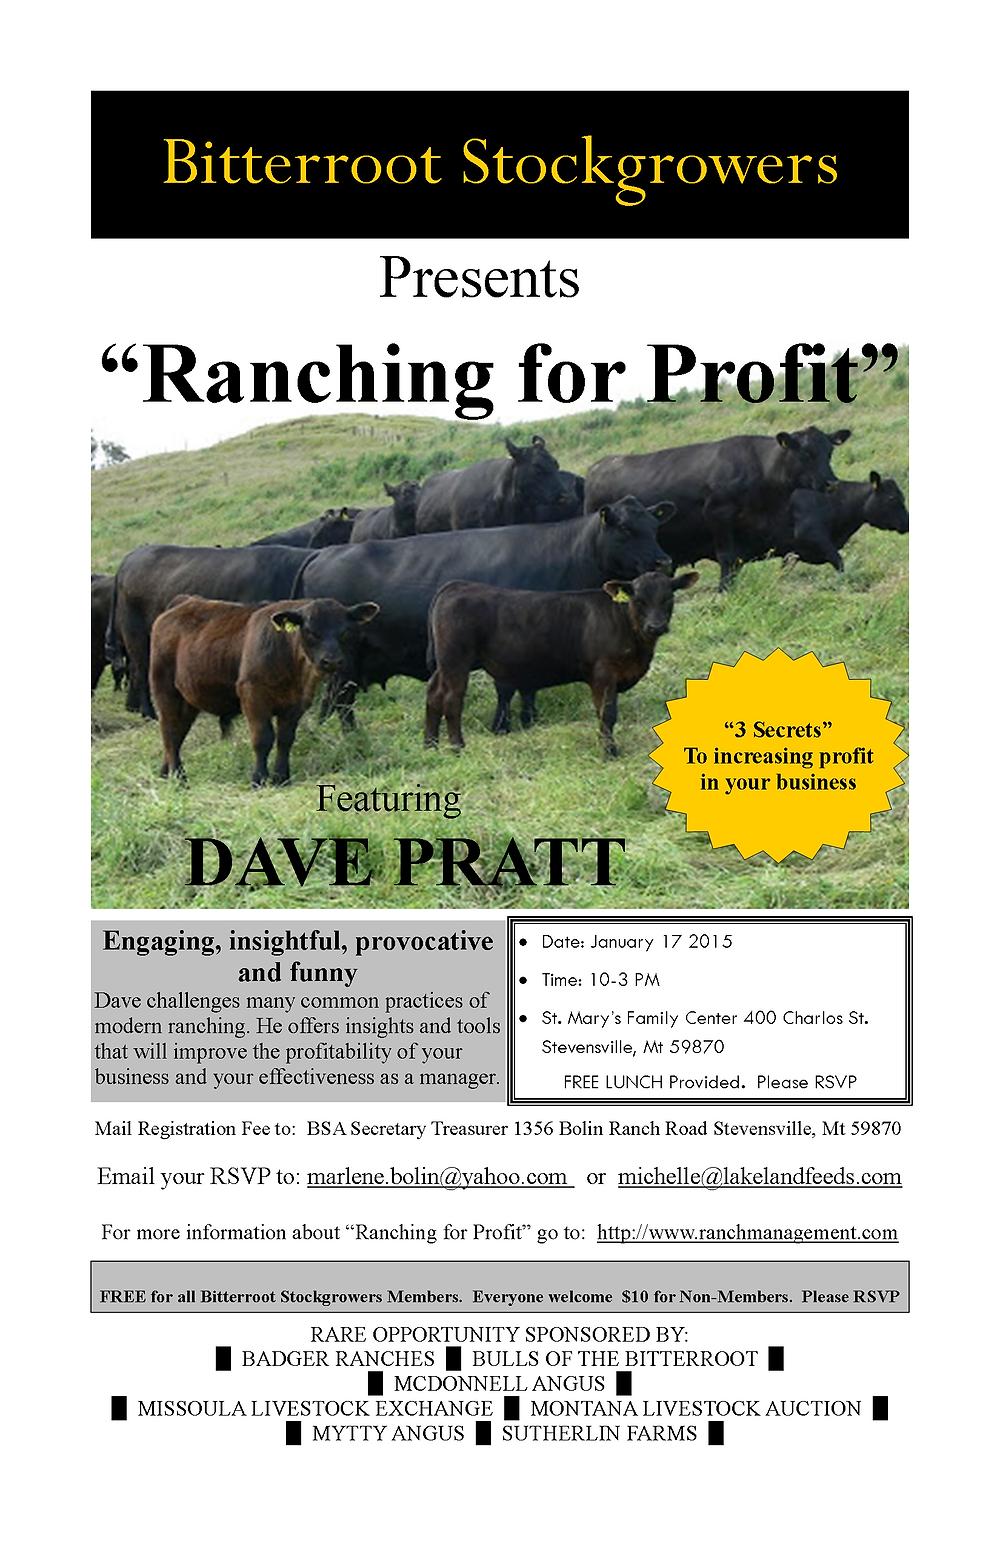 Dave Pratt Poster 2.png